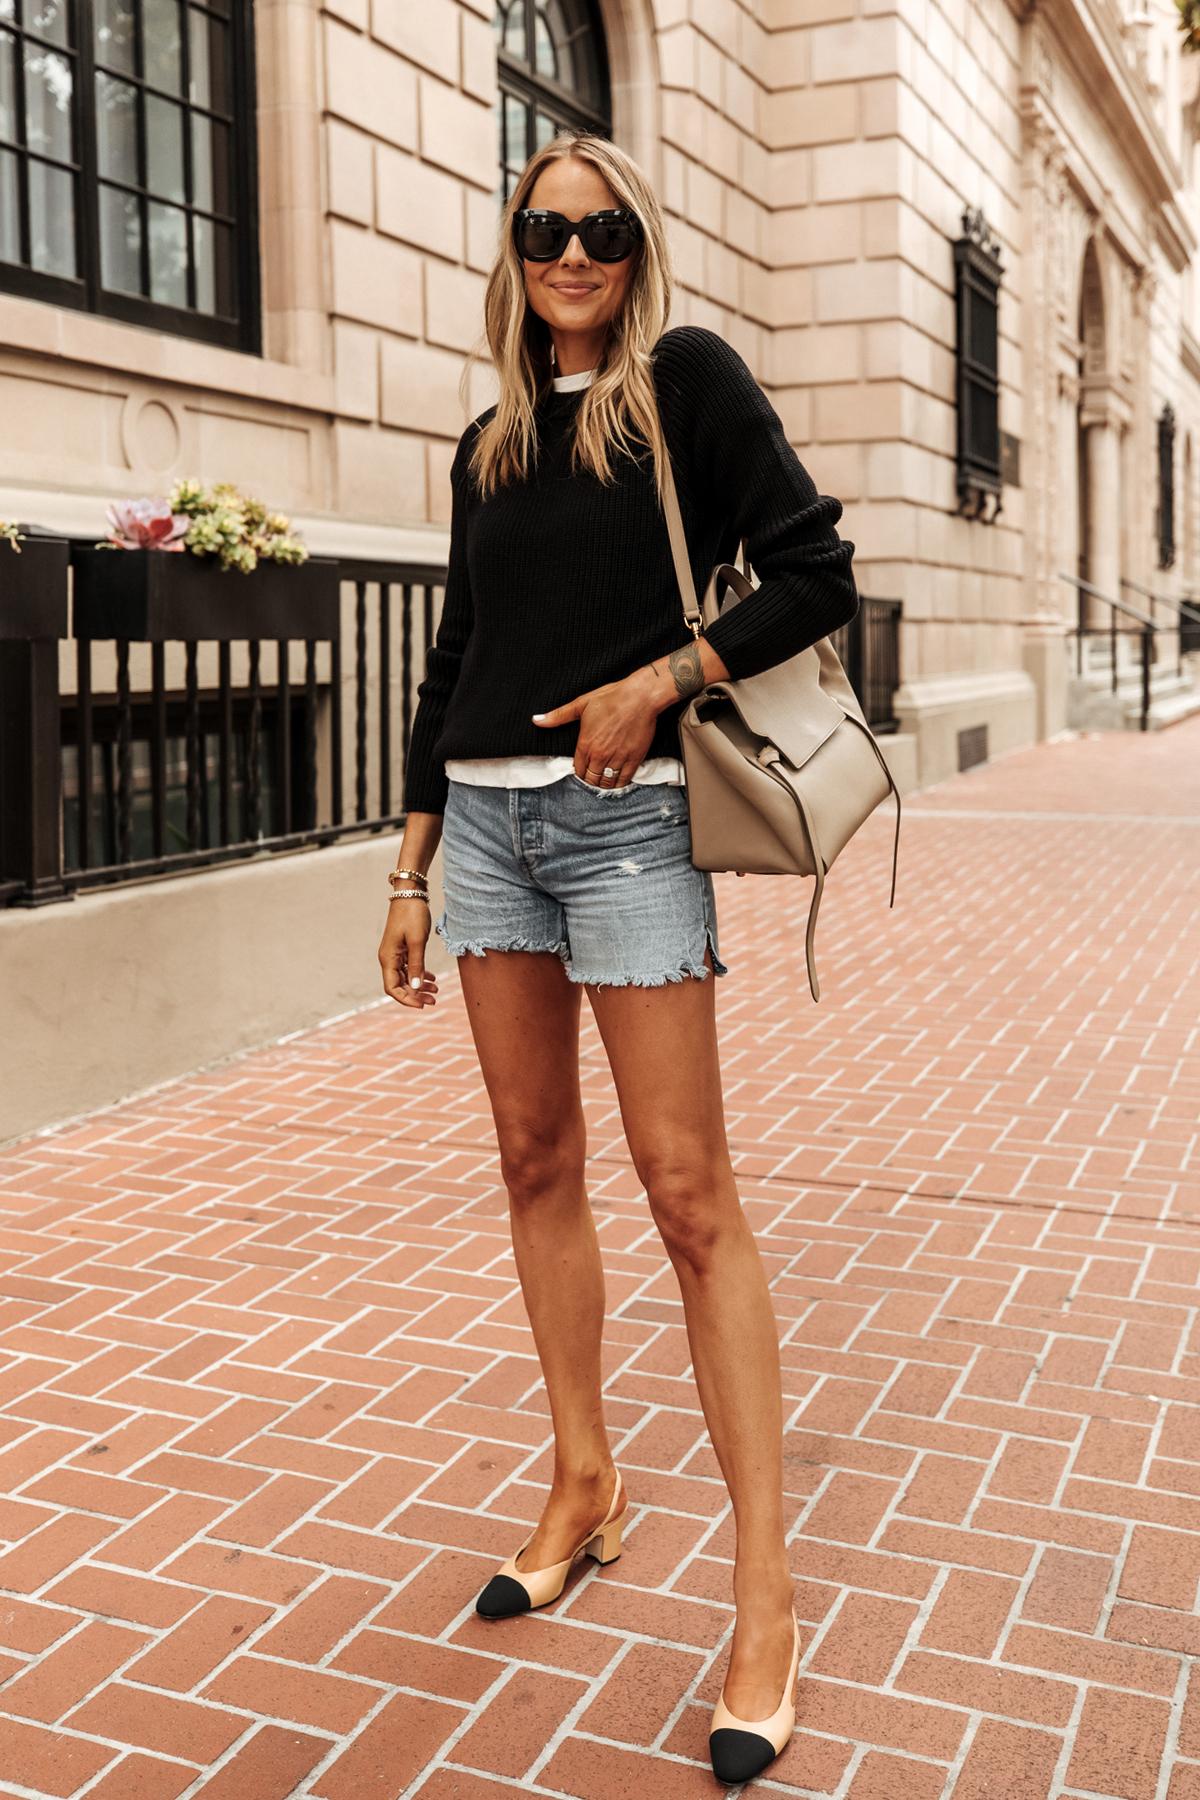 Fashion Jackson Wearing Jenni Kayne Black Fisherman Sweater White Tshirt Denim Shorts Chanel Slingbacks Outfit 3